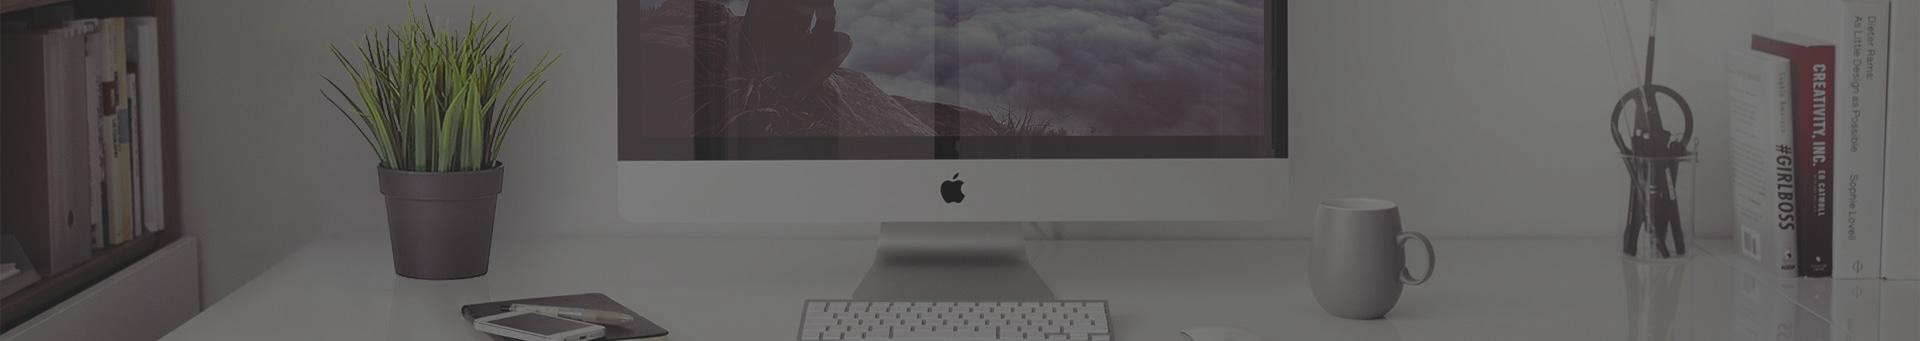 Web con Catálogo de Productos